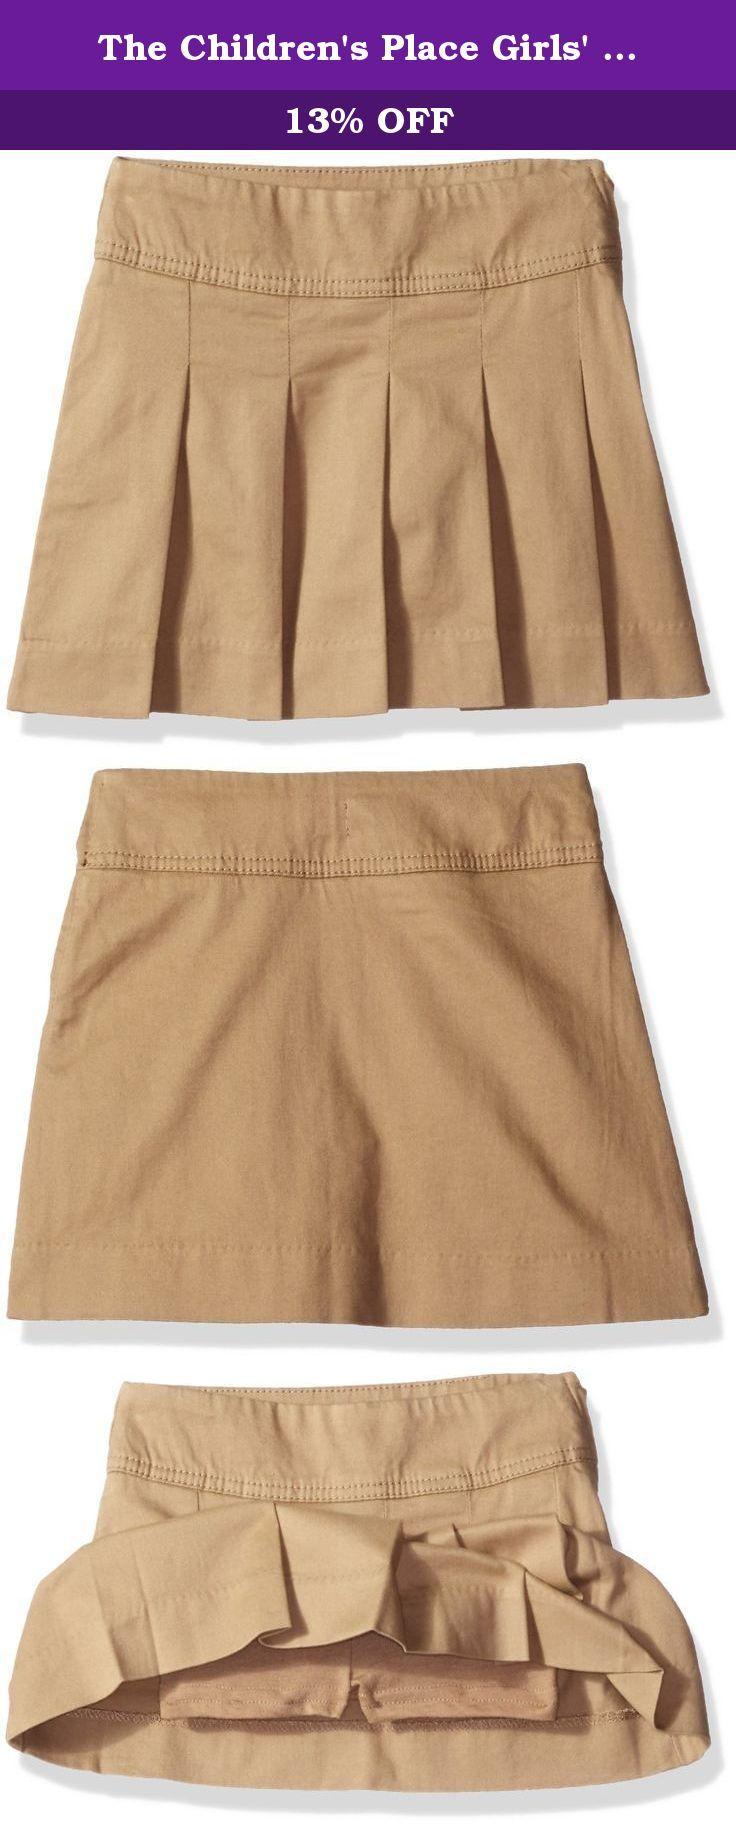 The Childrens Place Girls Big Uniform Skort